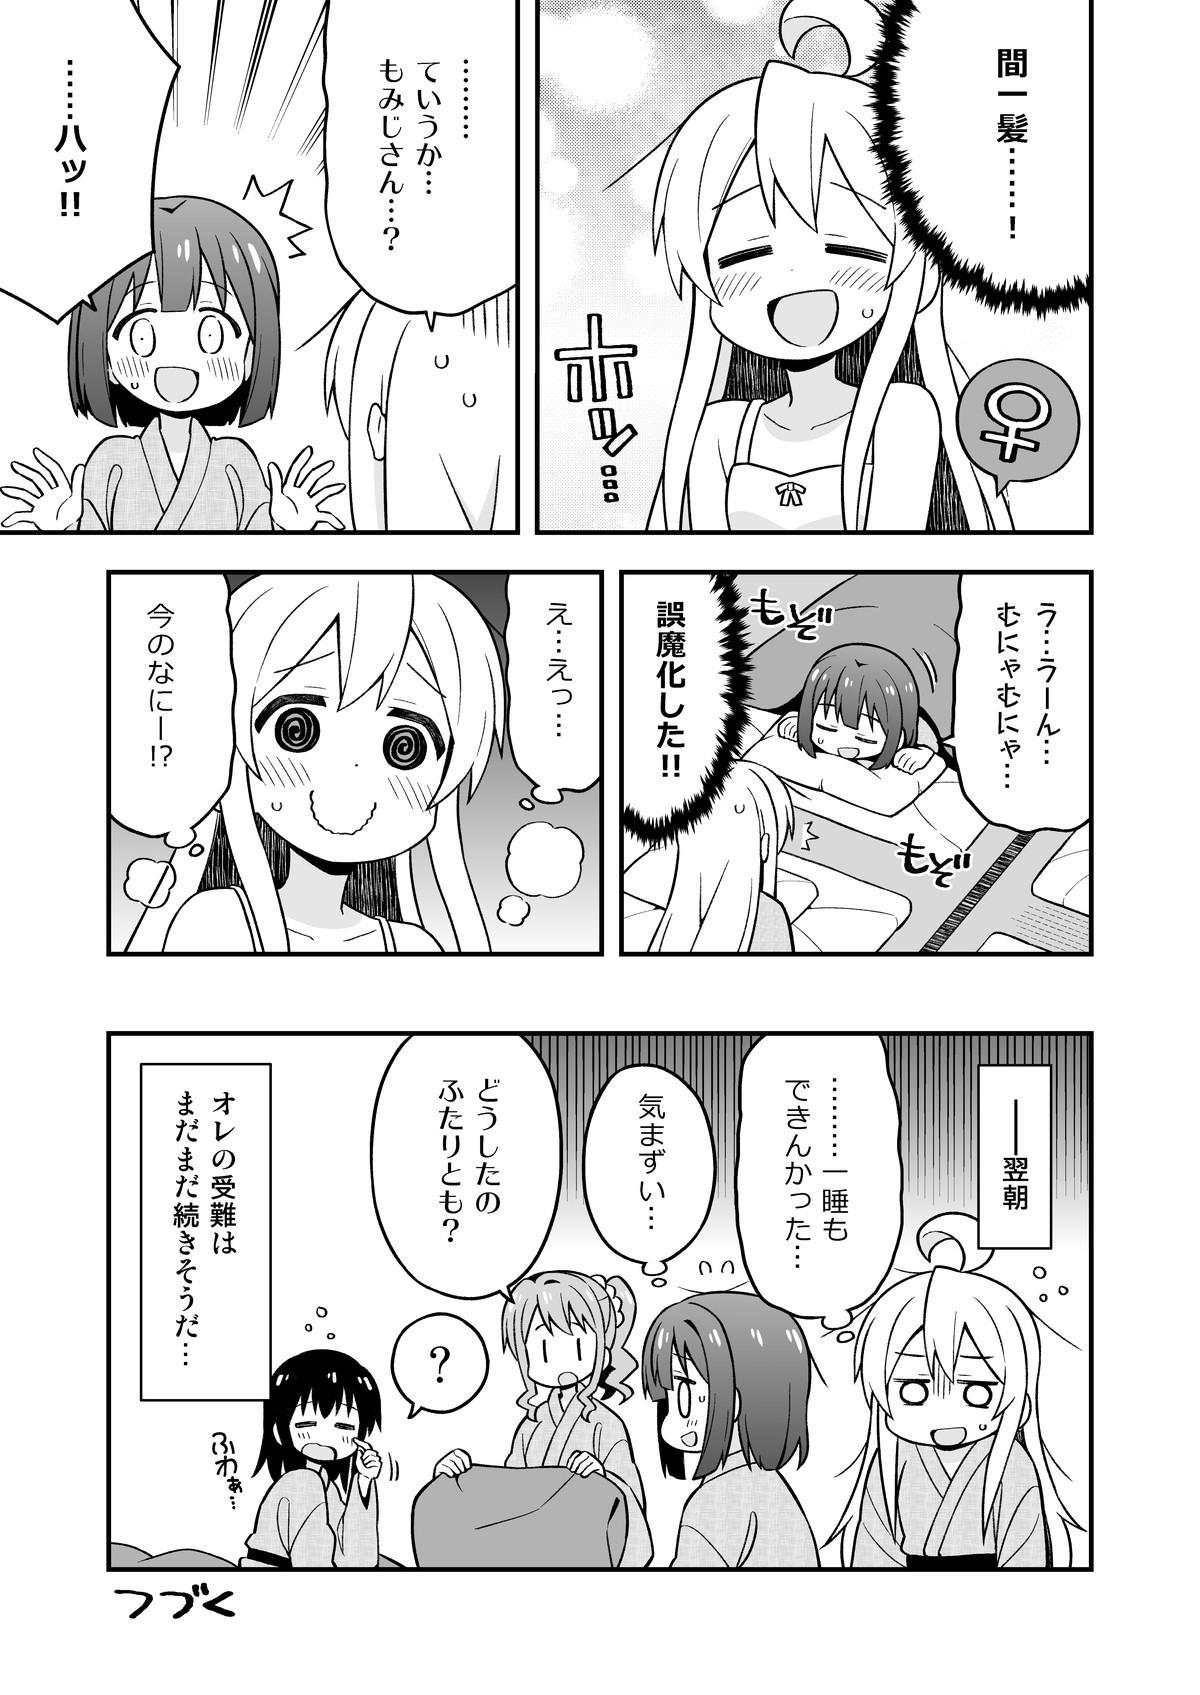 Onii-chan wa Oshimai! 6 41